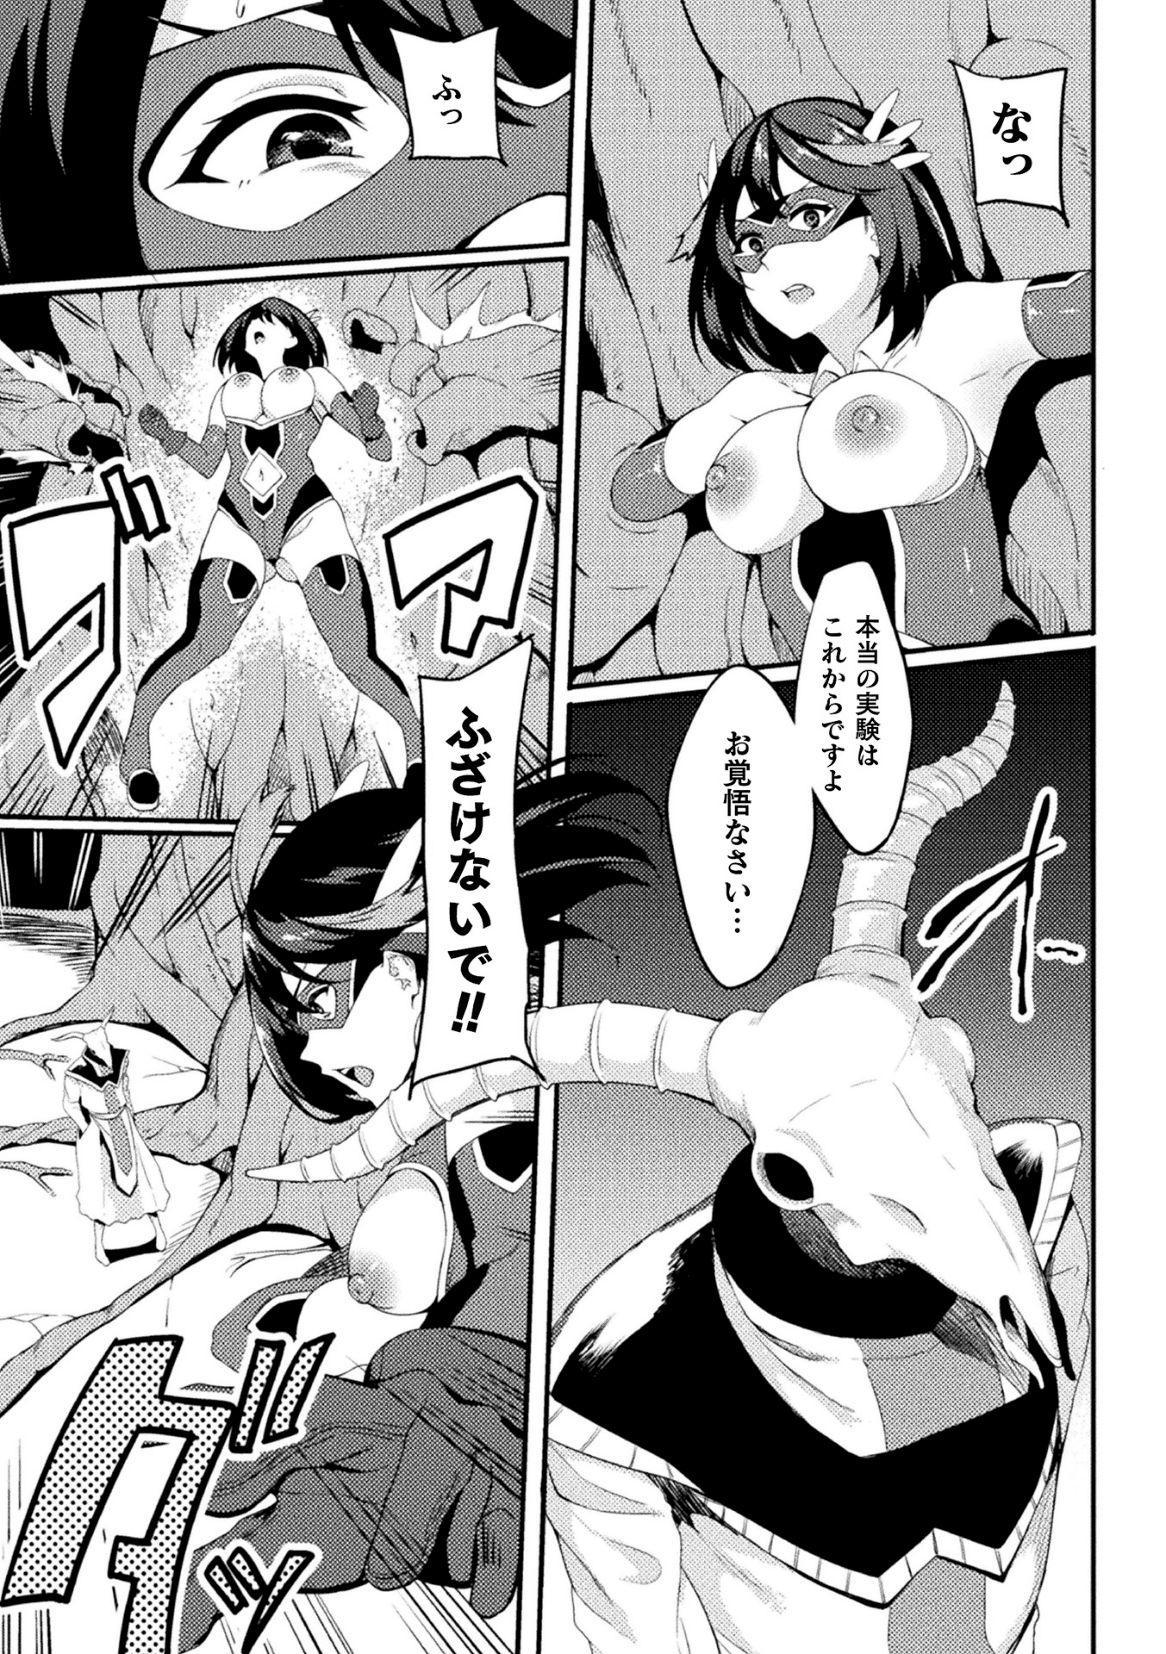 [Rinsun] Power Girl ~JK Super Heroine no Saiin Darakuki~ Ch. 2 4